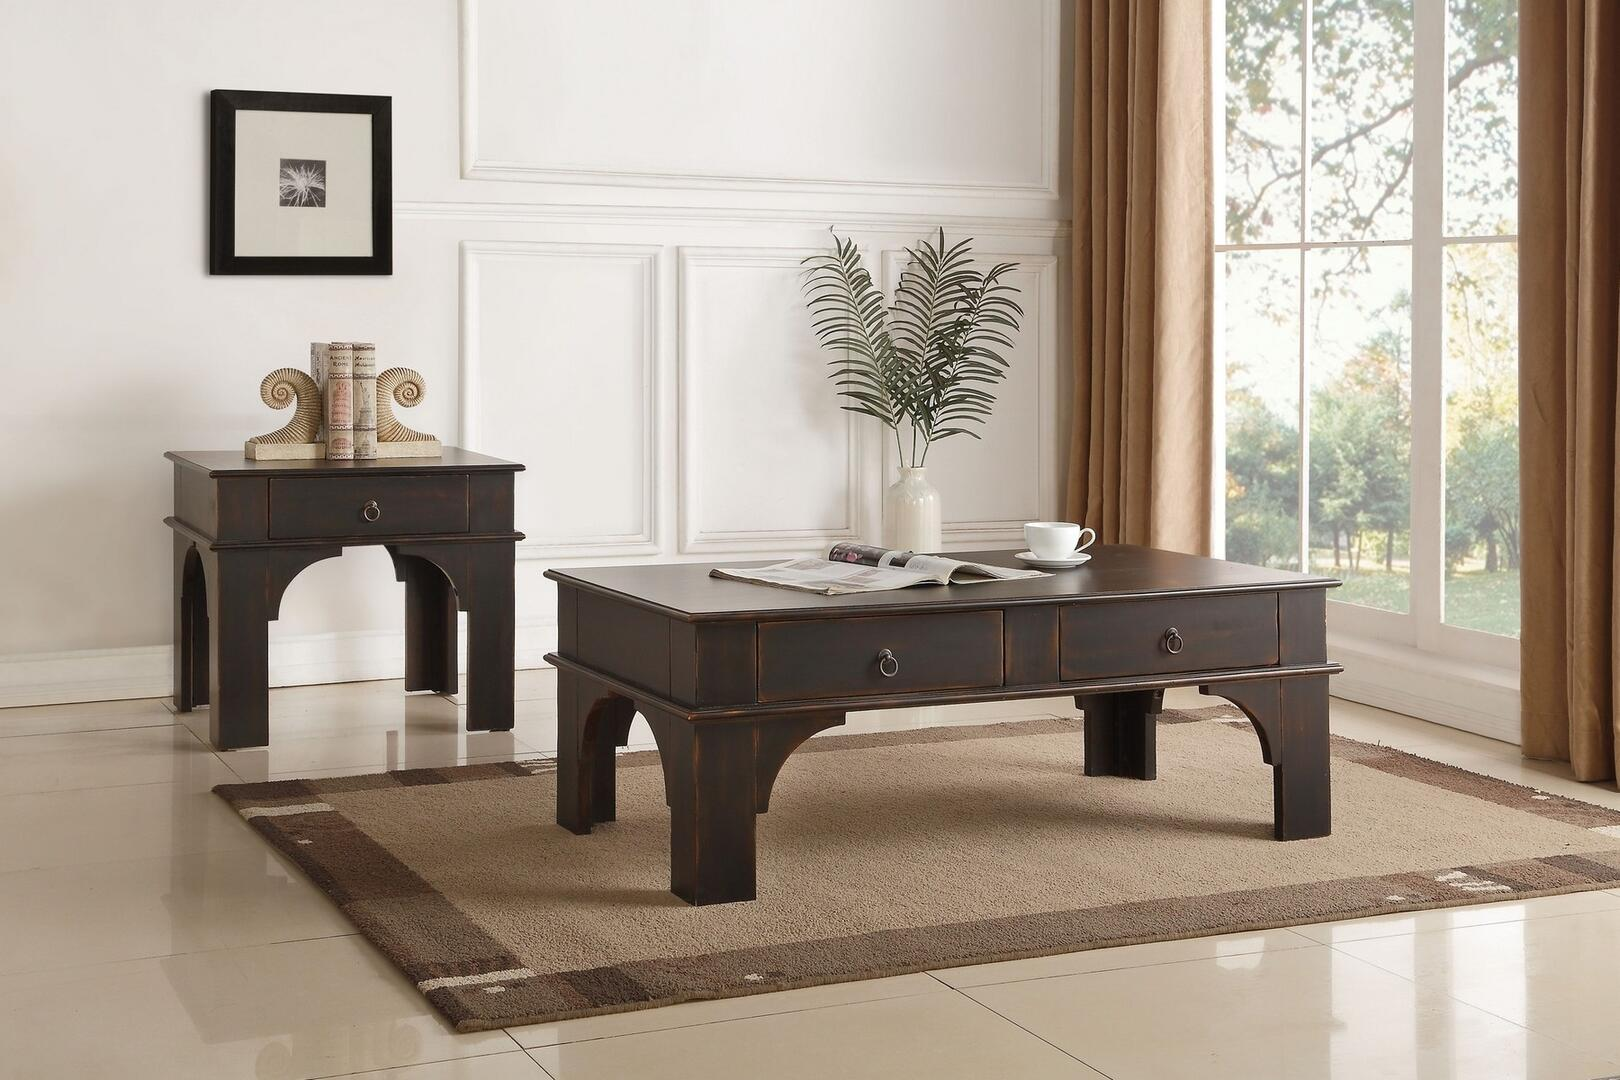 Acme furniture elvira coffee and end table set